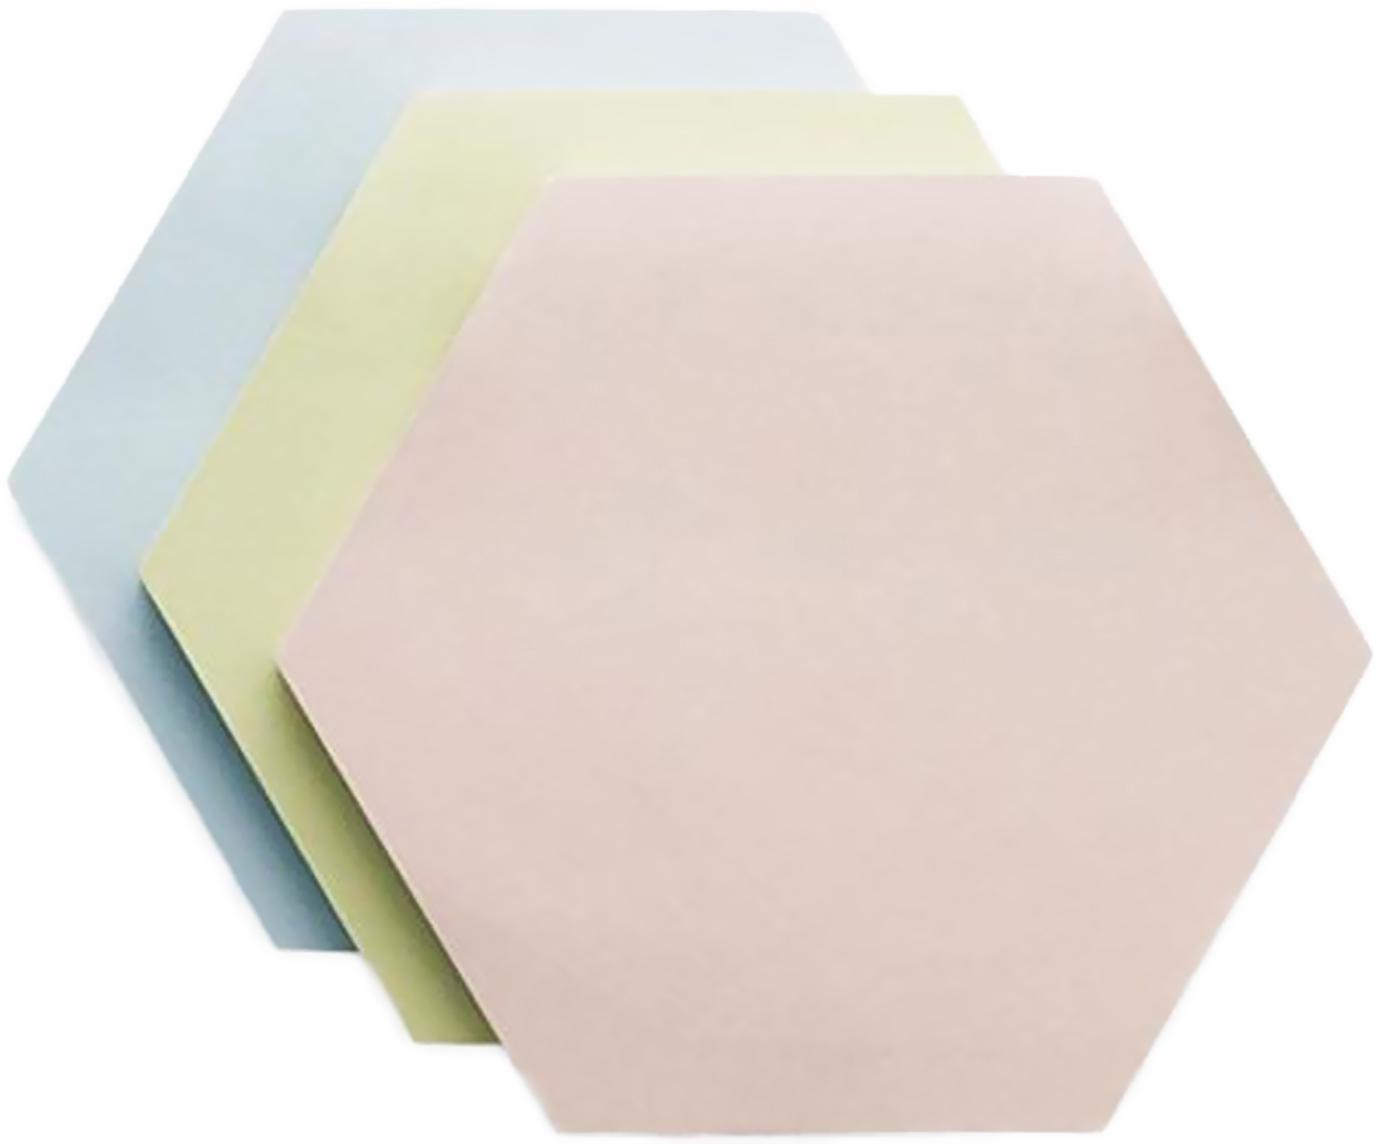 Haftnotizblock-Set Remember, 3-tlg., Papier, bedruckt, Blau, Grün, Rosa, B 9 x T 8 cm